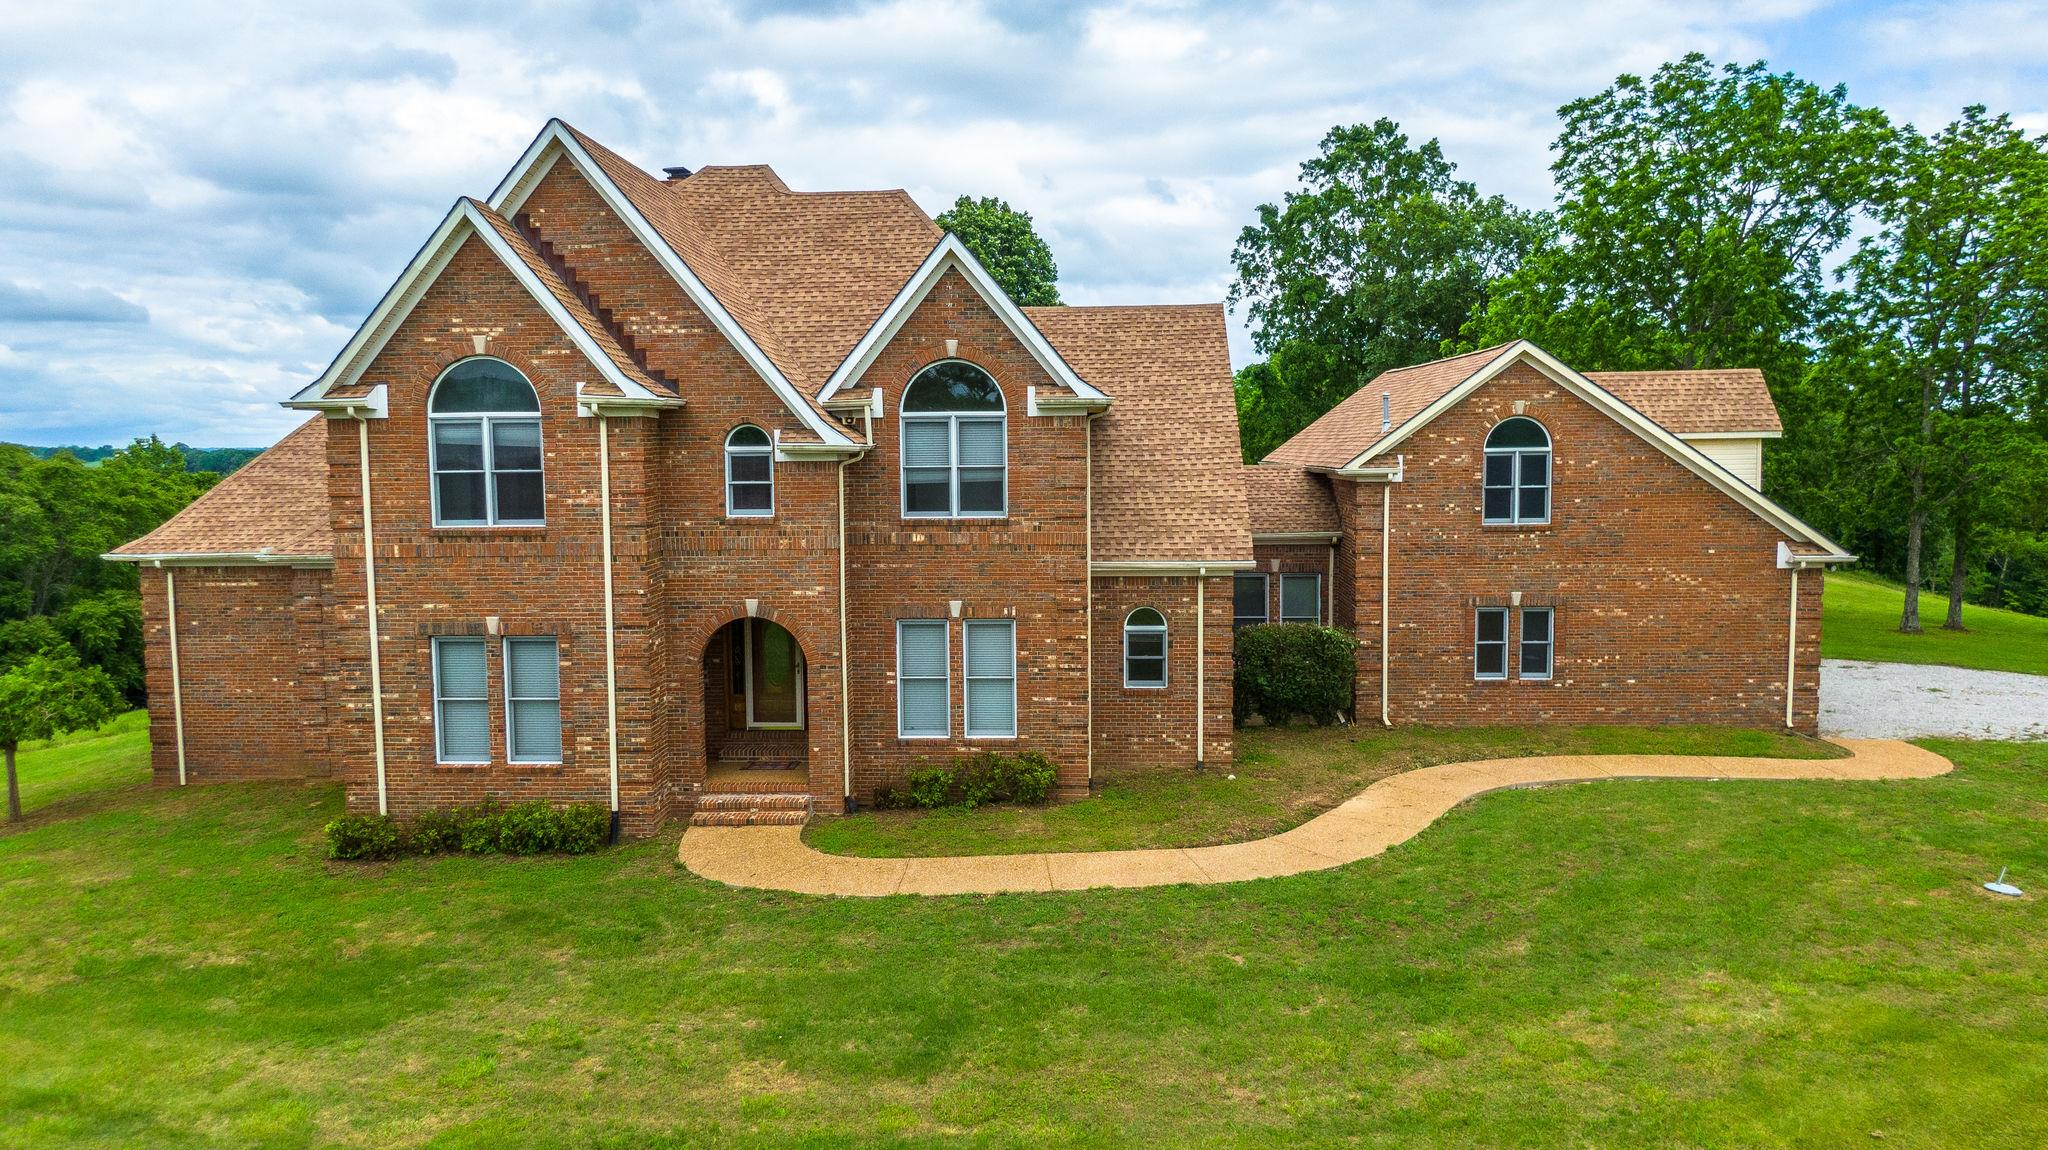 5668 Campbellsville Road, Pulaski, TN 38478 - Pulaski, TN real estate listing